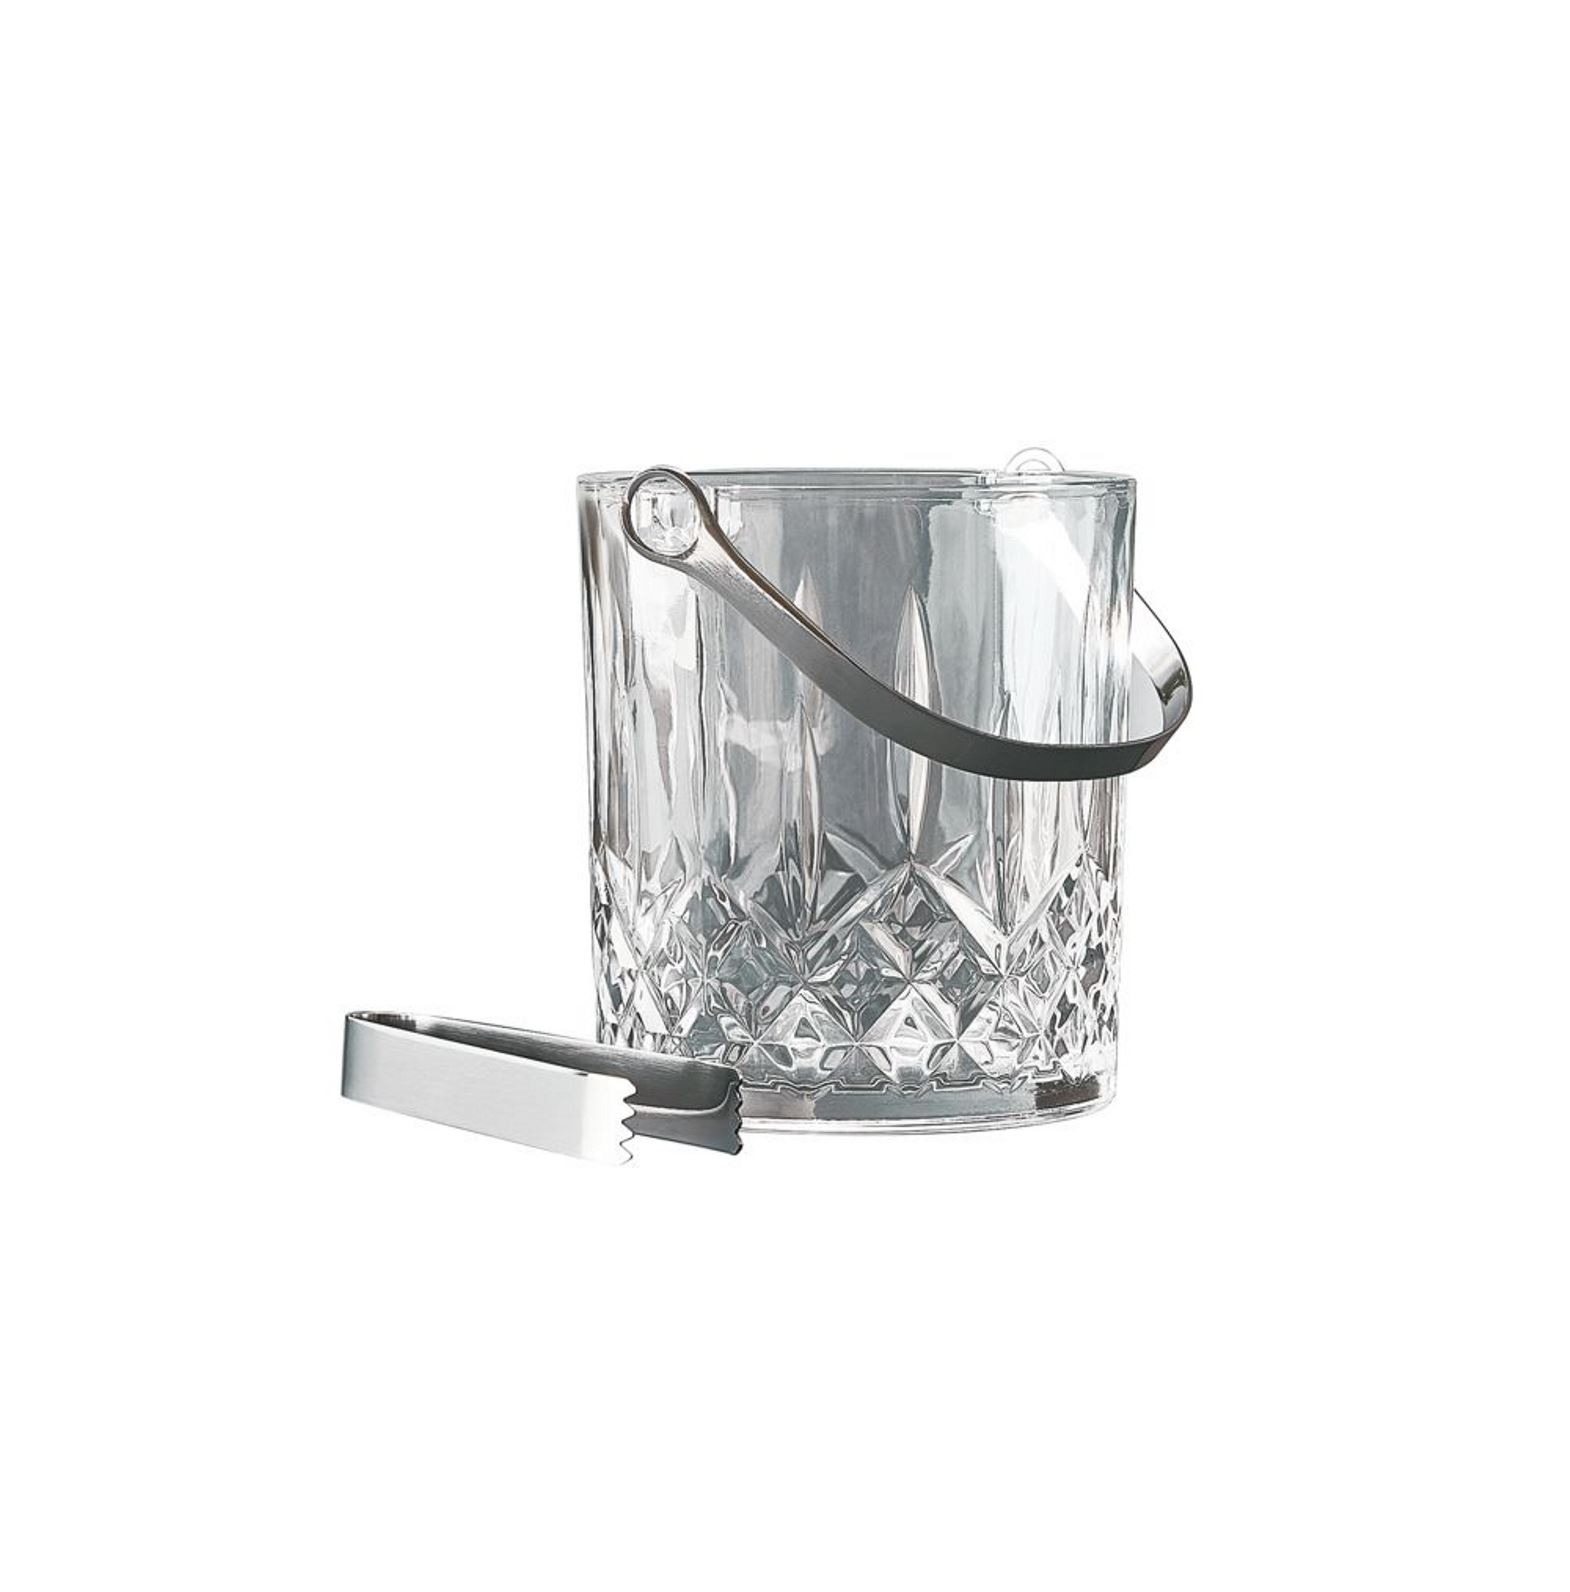 Онлайн каталог PROMENU: Ведерко для льда со щипцами Aida HARVEY, прозрачный, 2 предмета                               80368ks